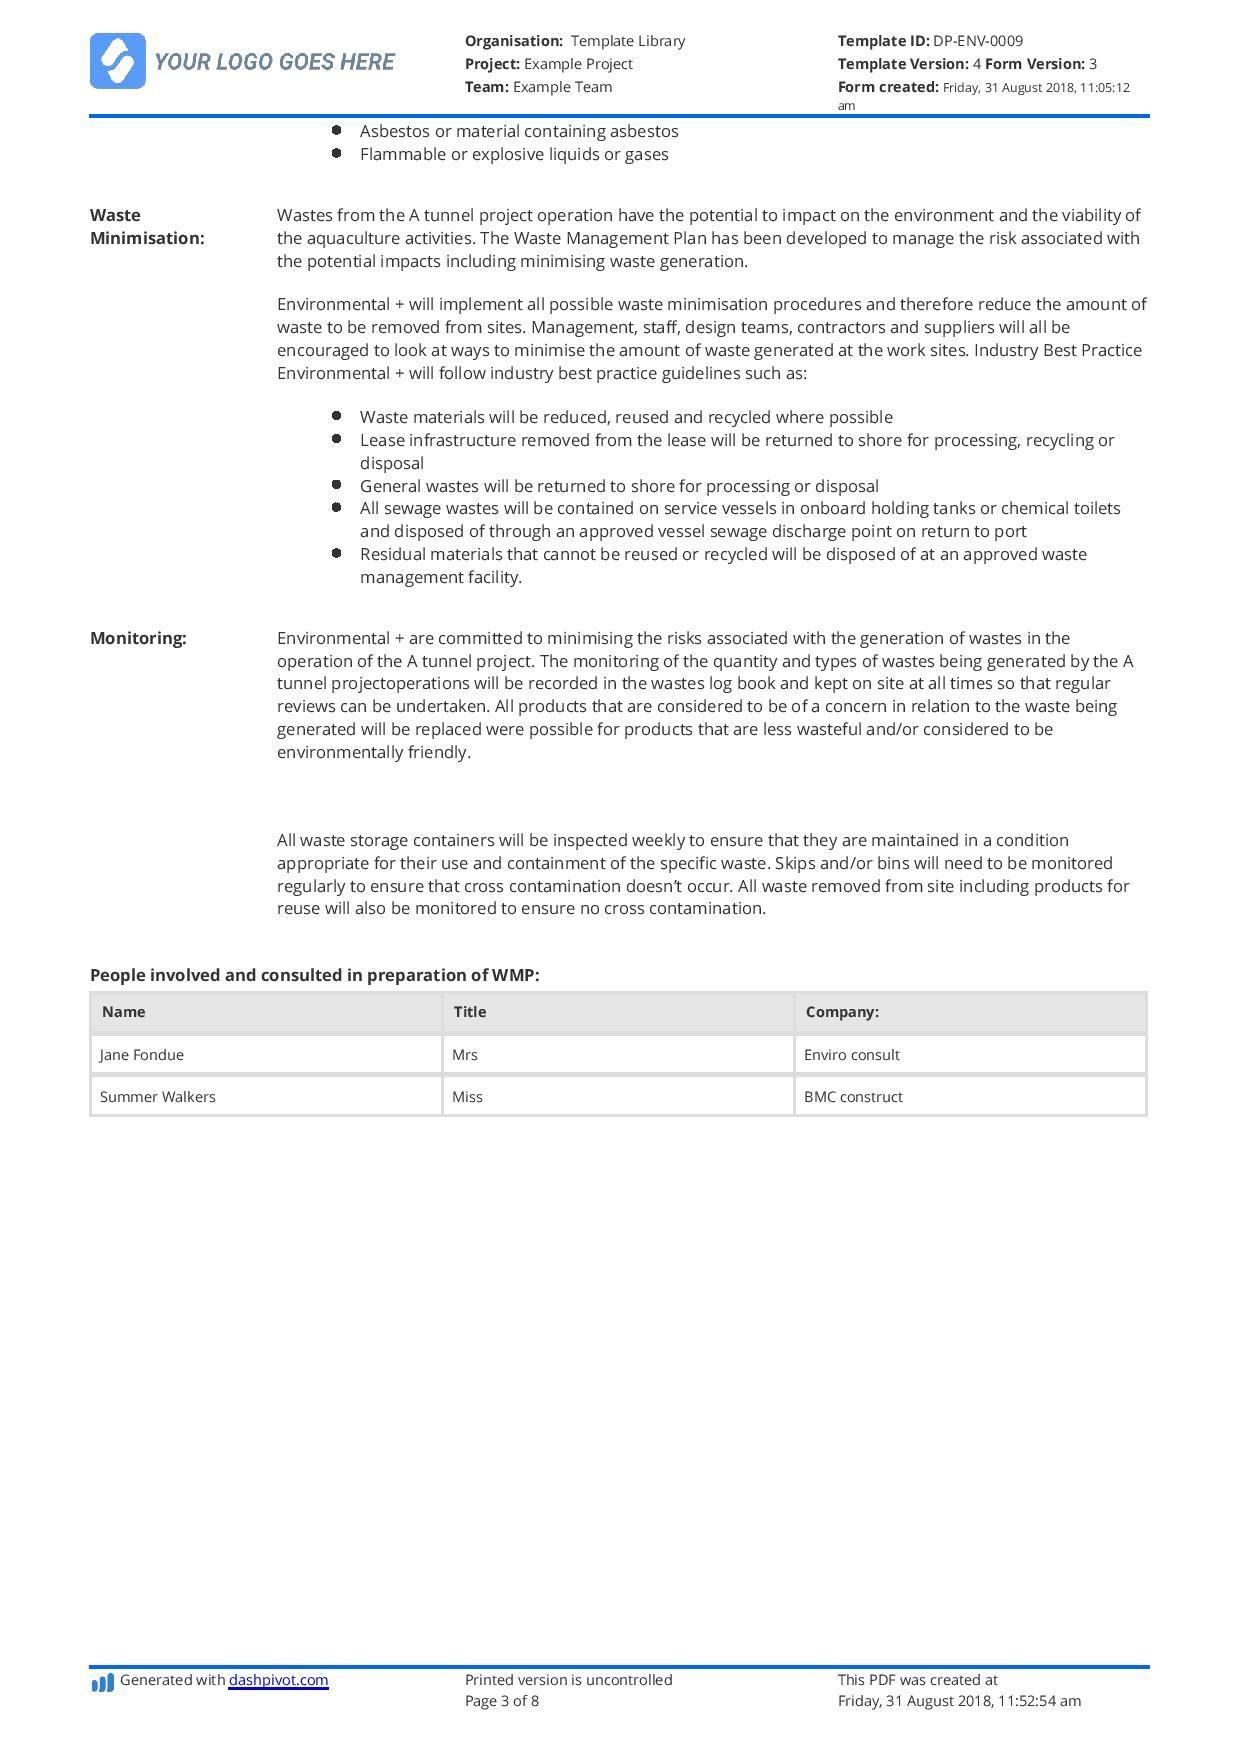 Hazardous Waste Management Plan Template Free And